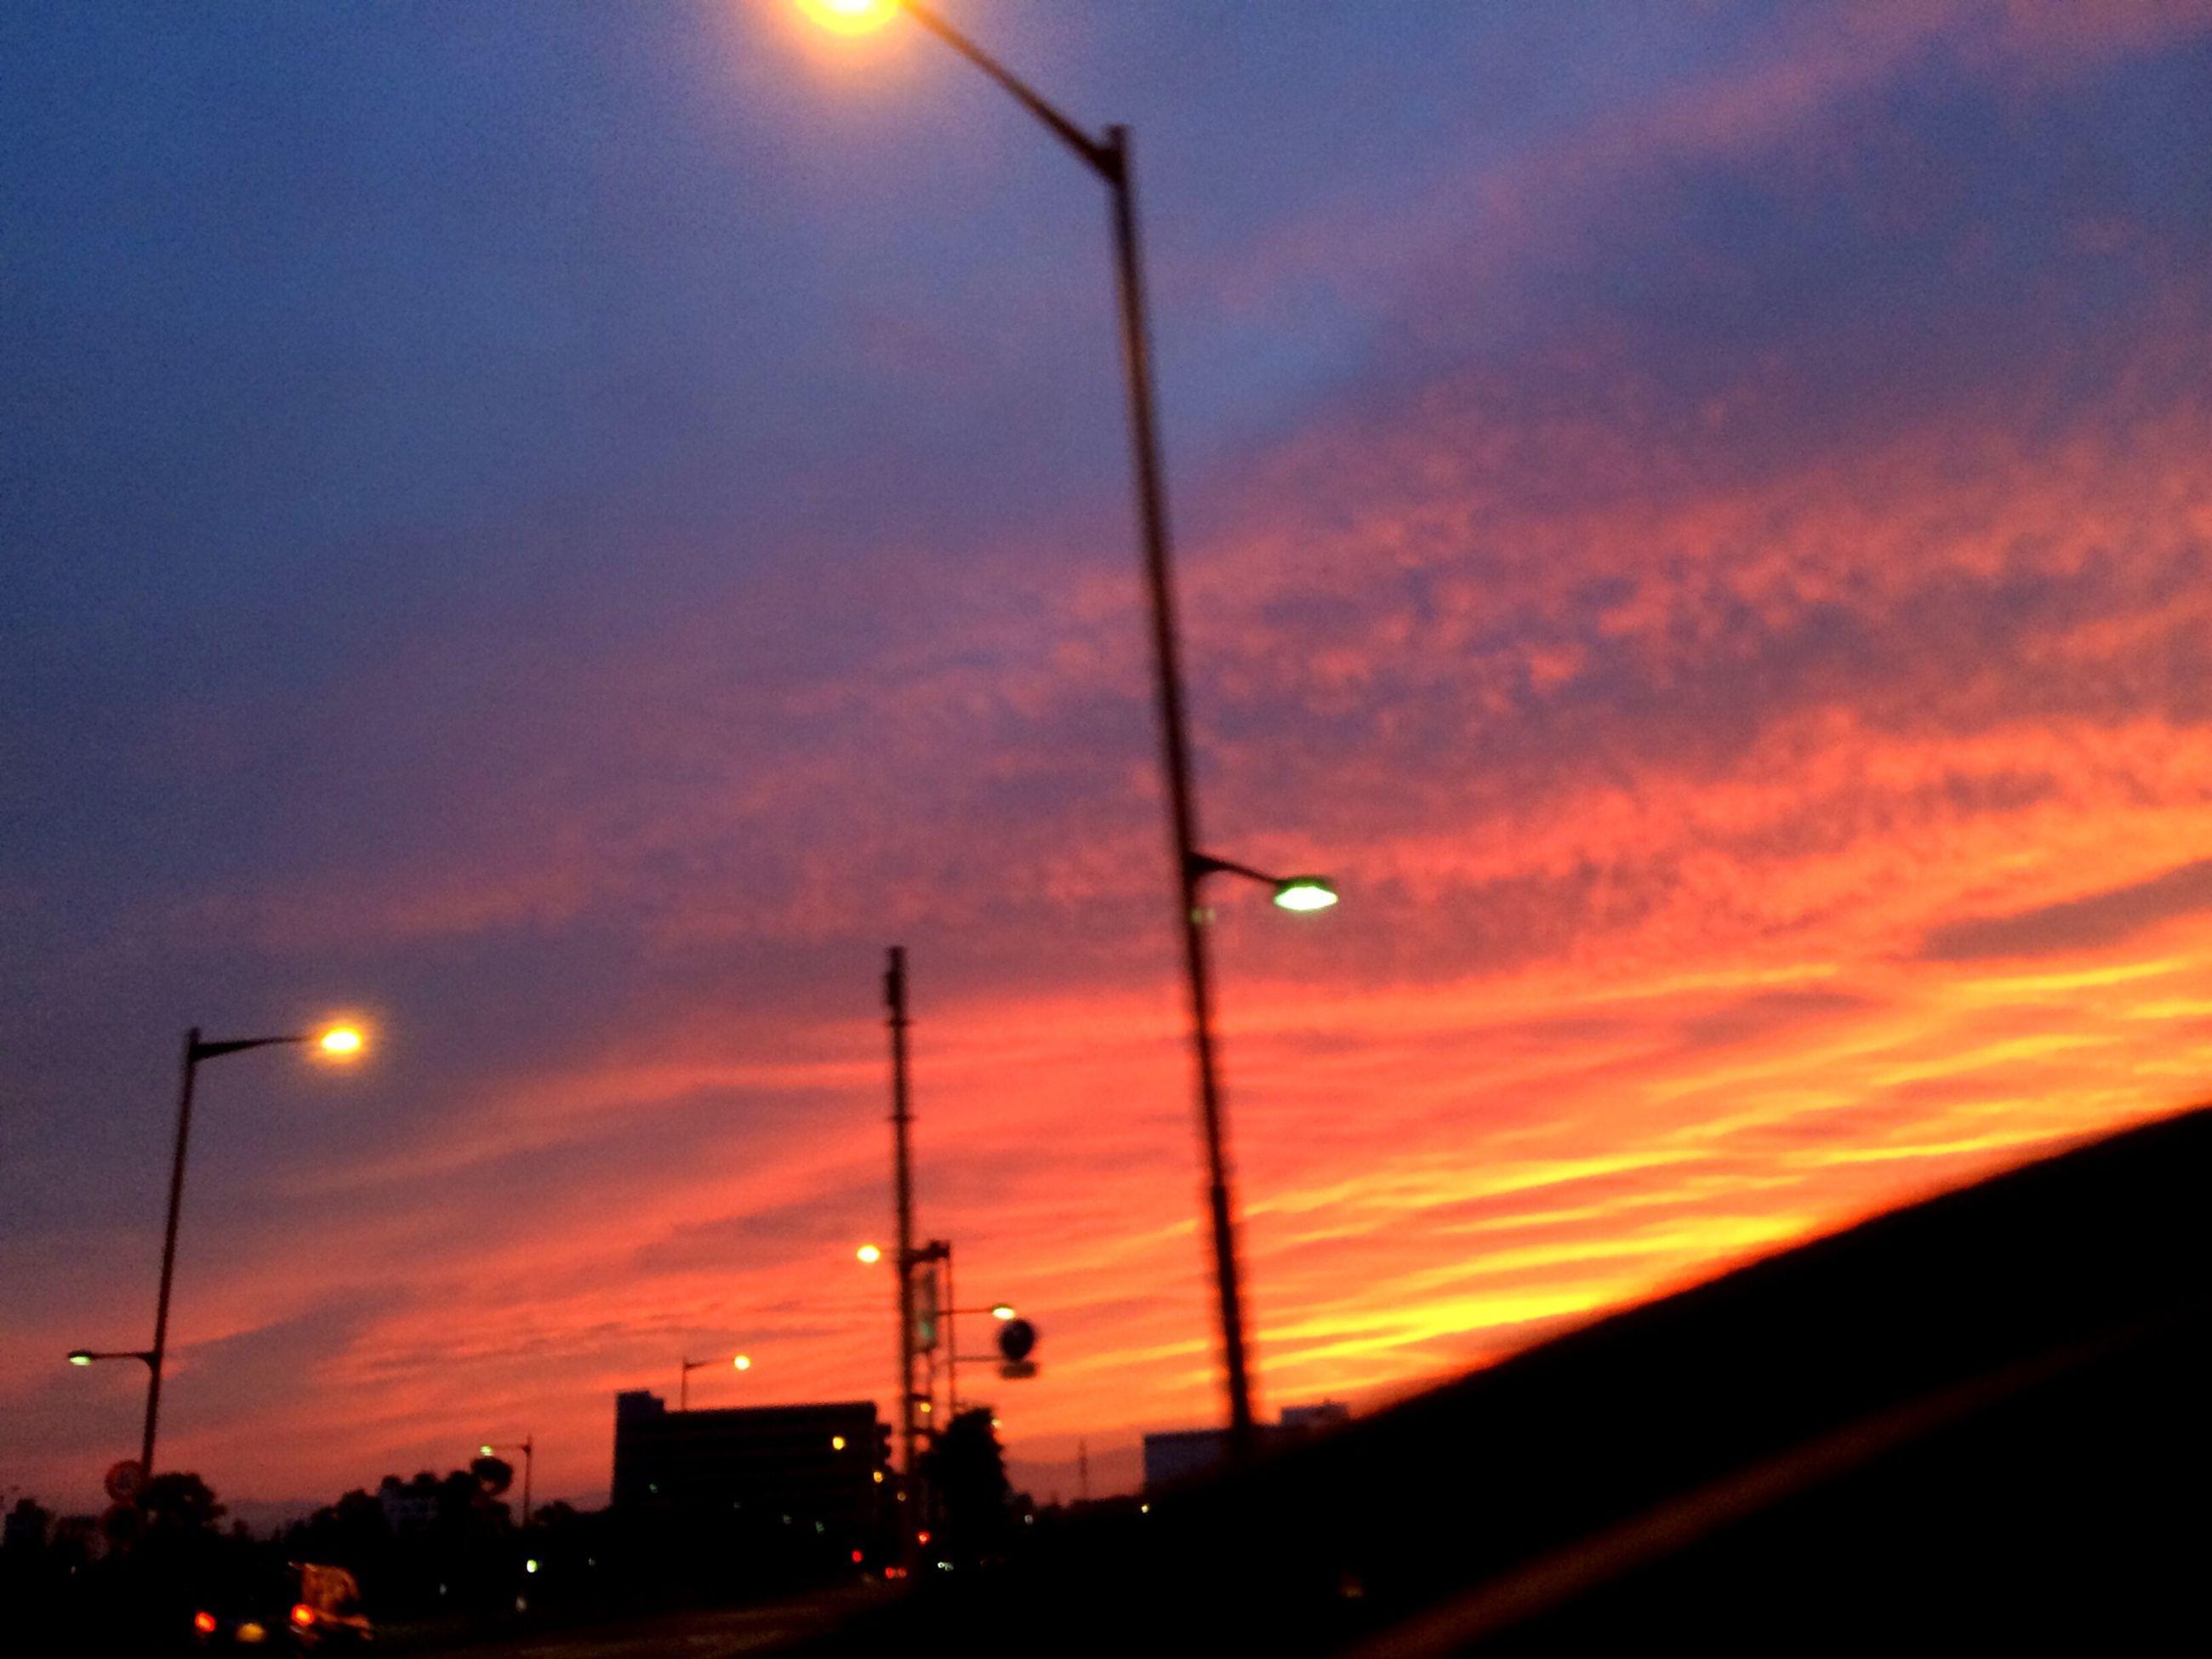 sunset, street light, silhouette, sky, orange color, low angle view, cloud - sky, lighting equipment, dramatic sky, transportation, cloud, car, electricity pylon, dusk, power line, beauty in nature, cloudy, nature, scenics, illuminated